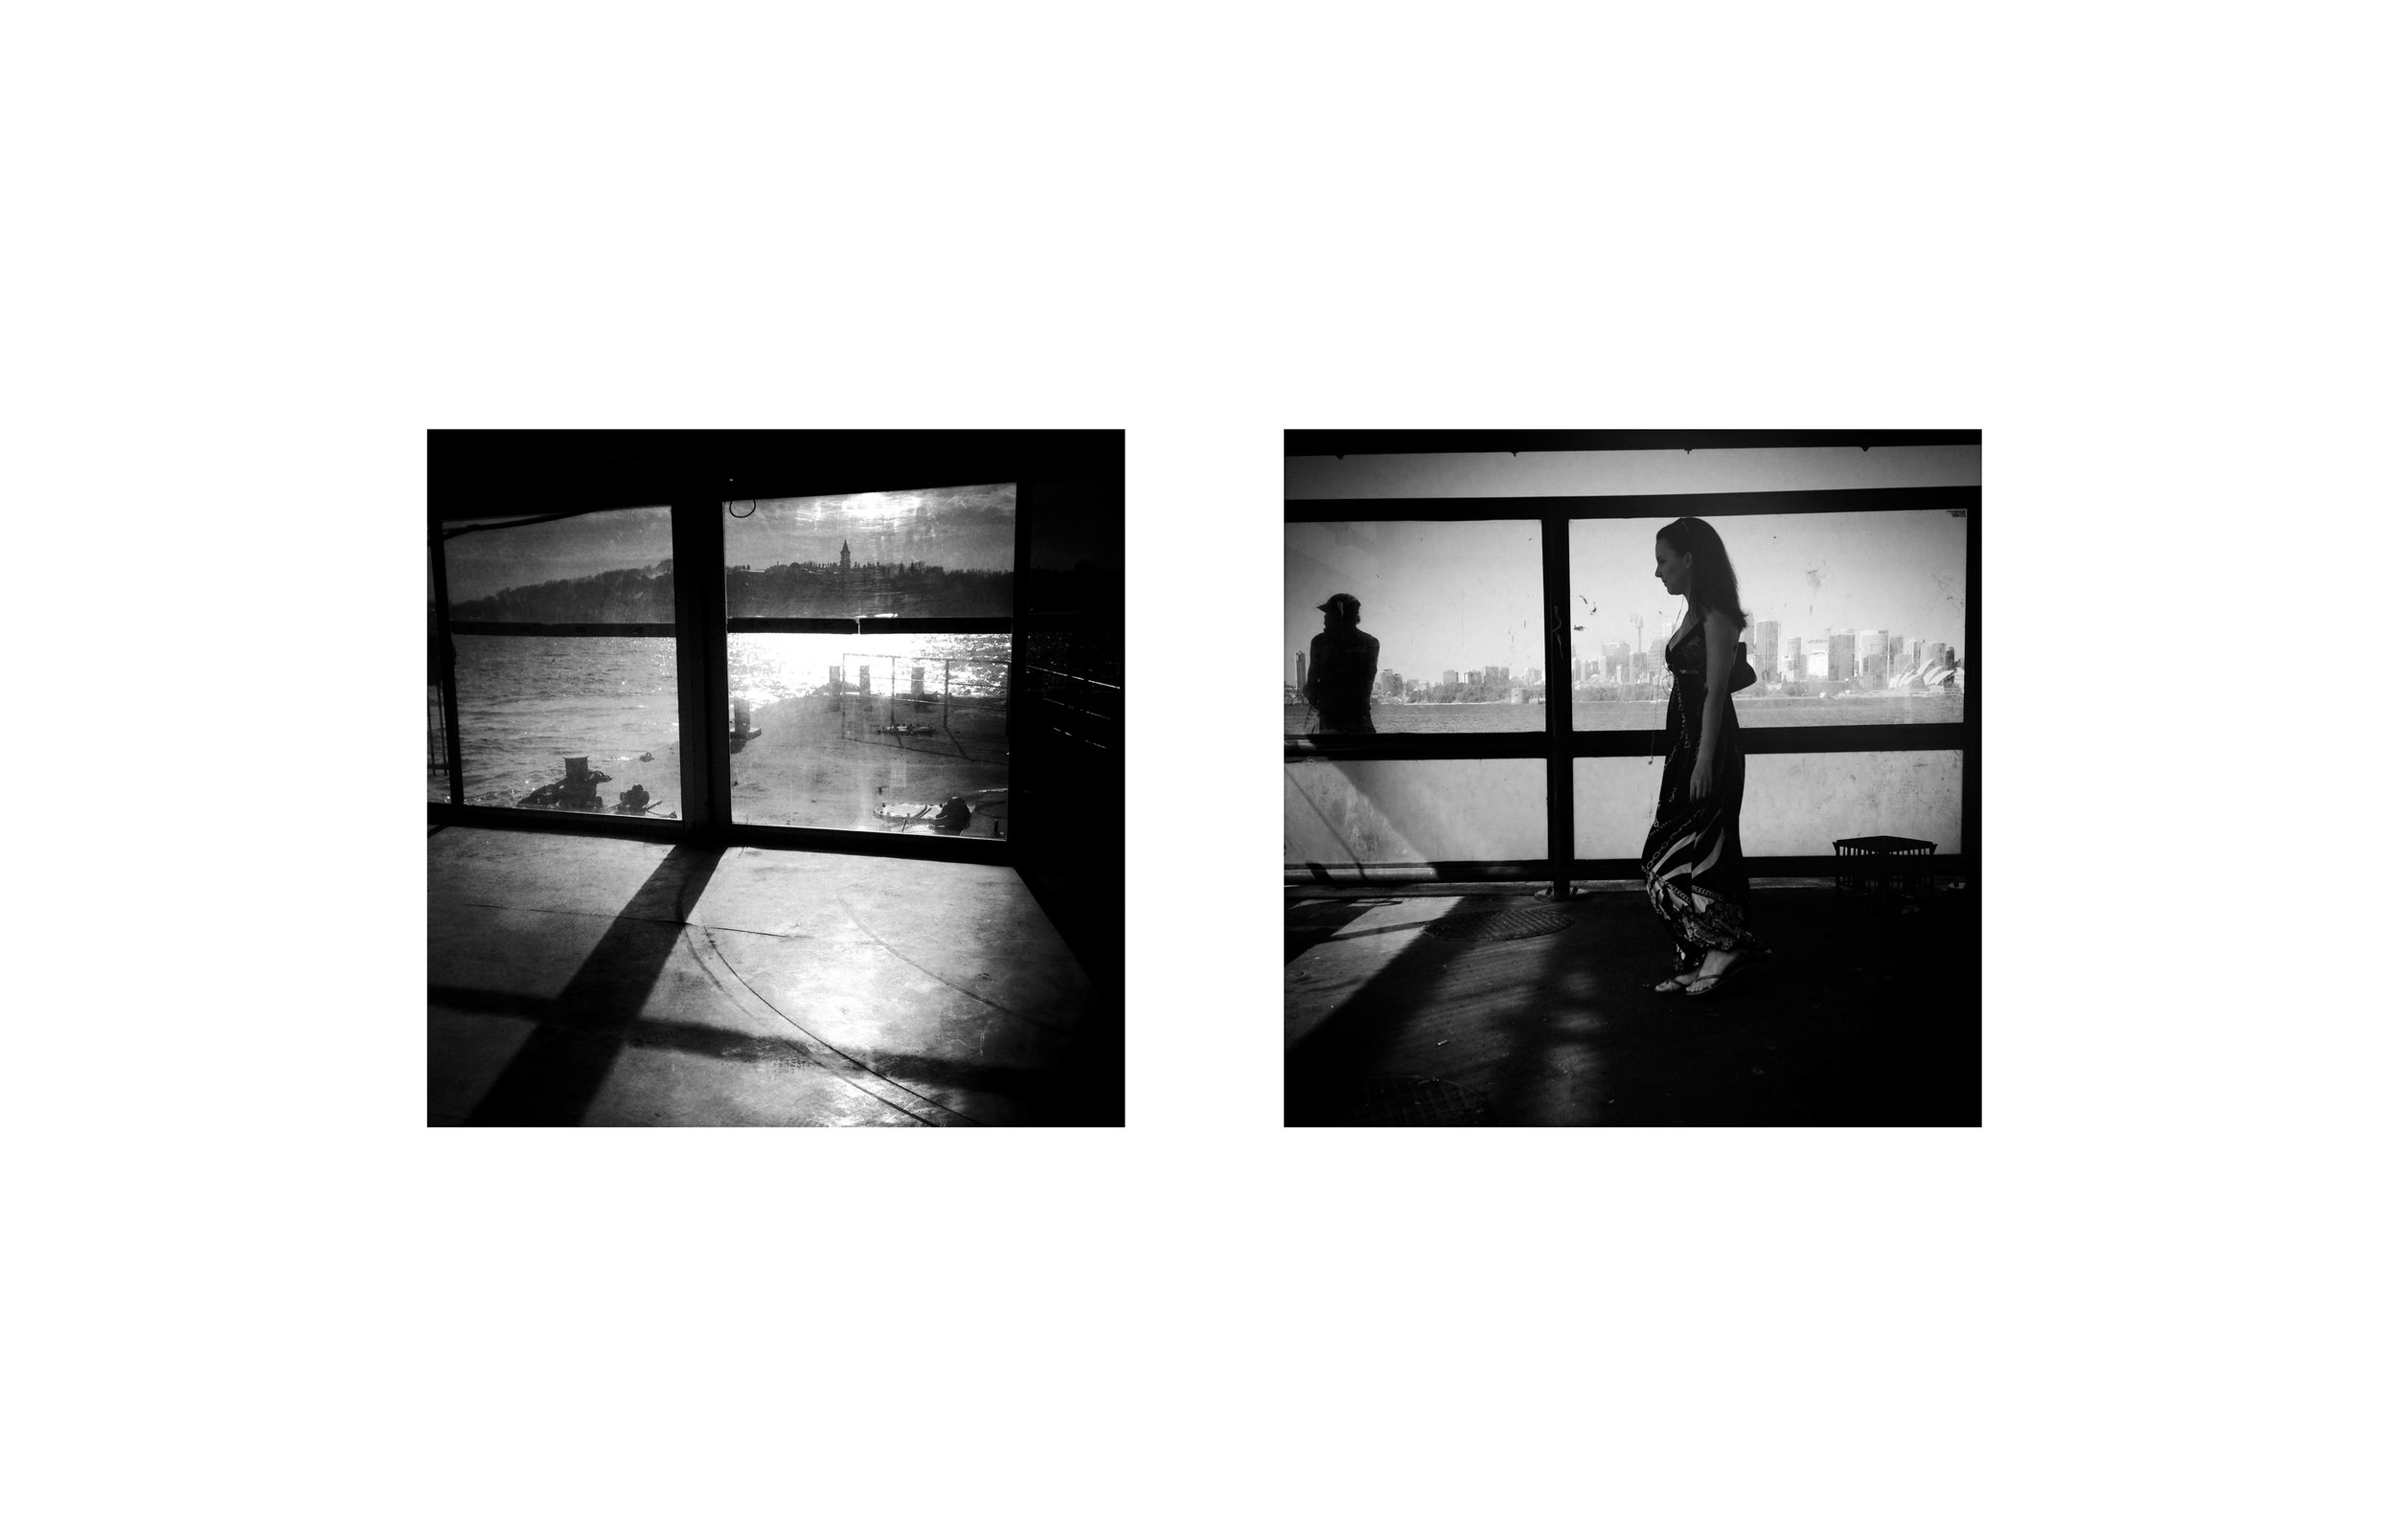 Mirrored_Andersen_Suyabatmaz42.jpg